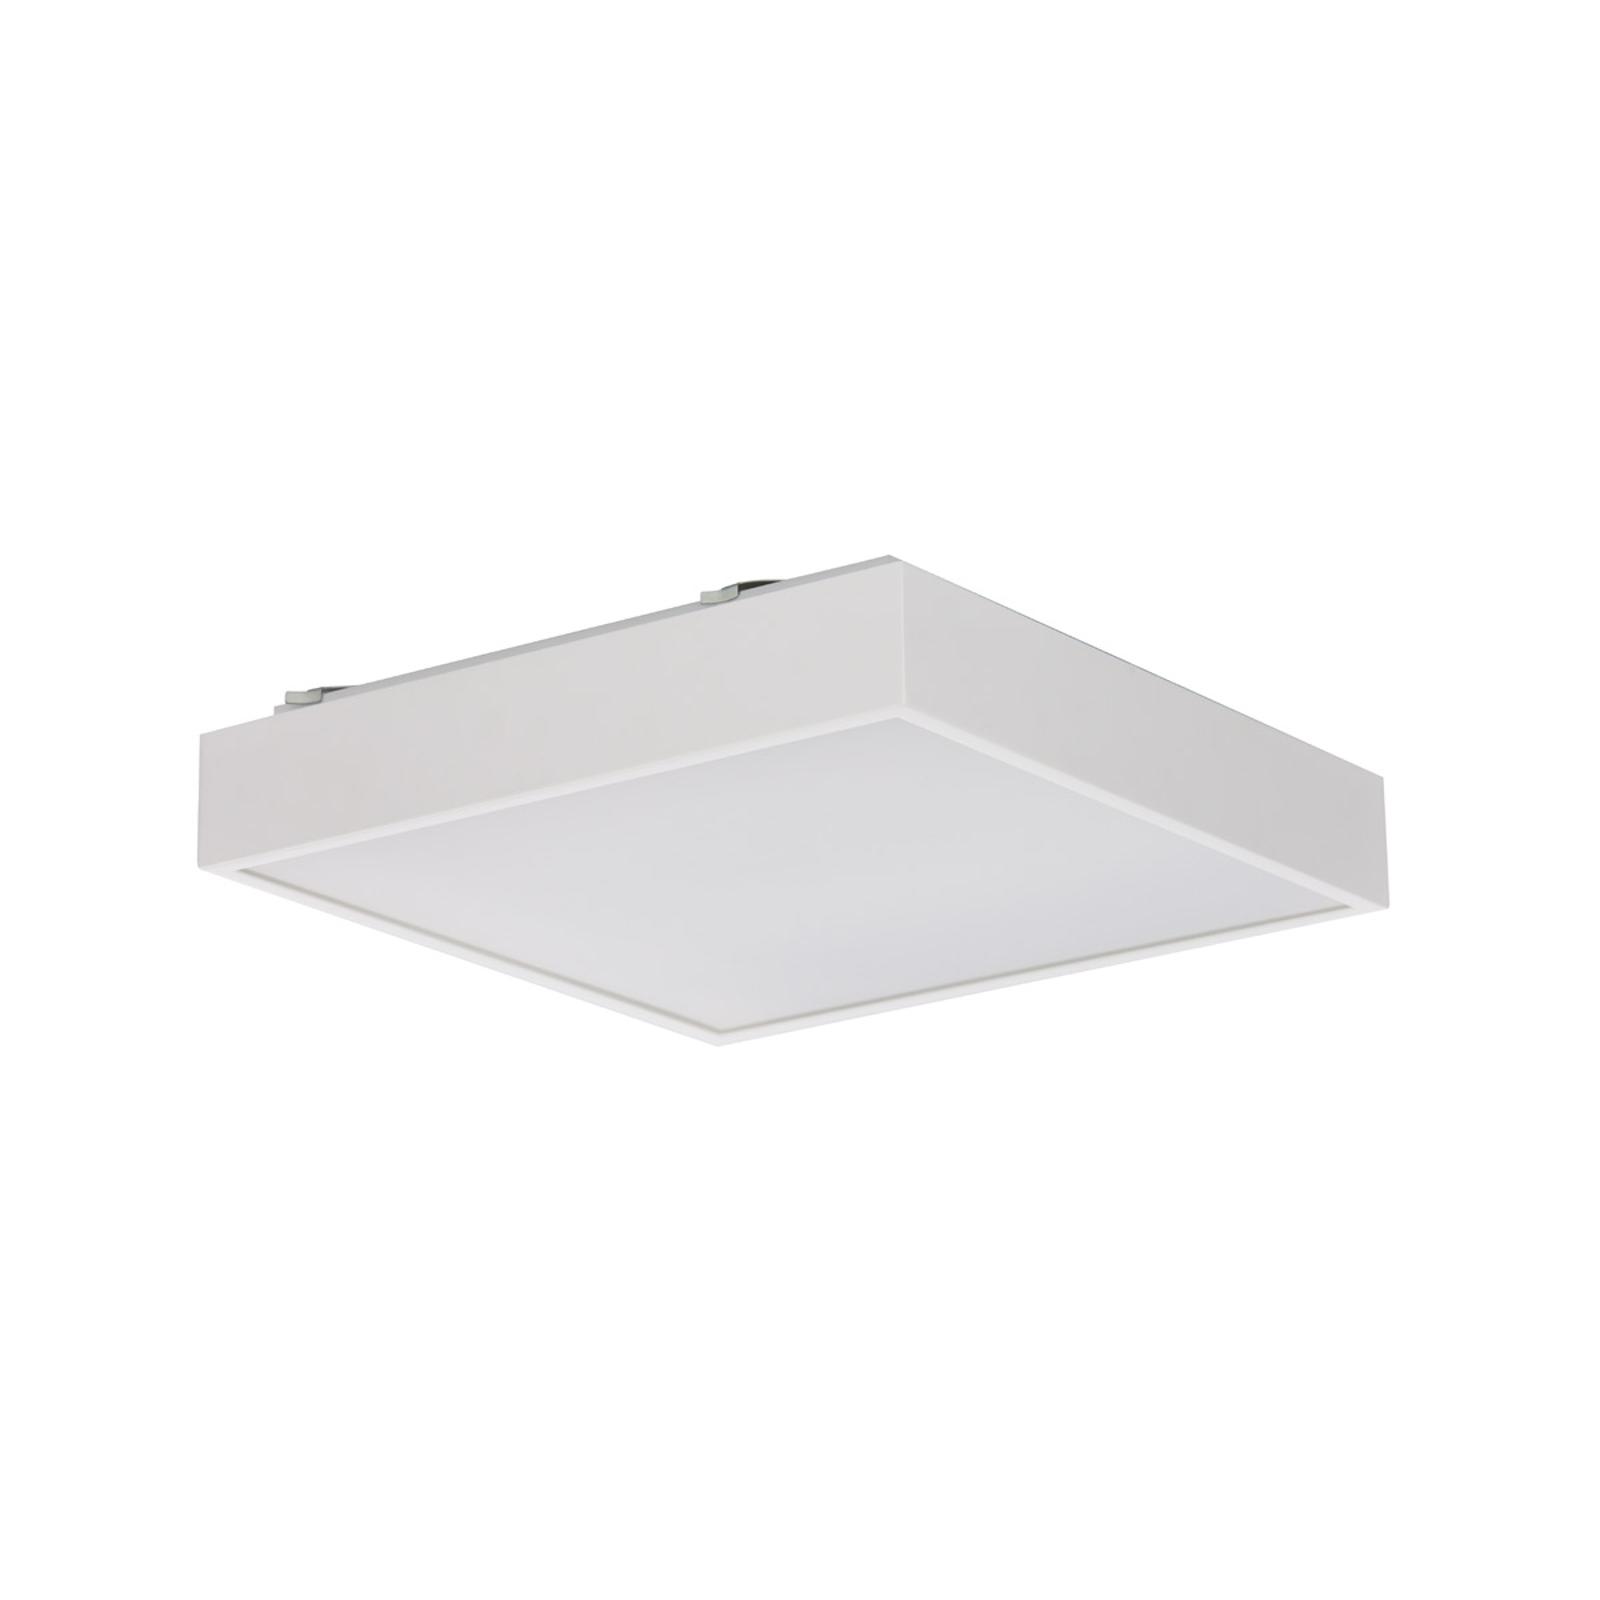 Lampa sufitowa Q4 LED biała DALI